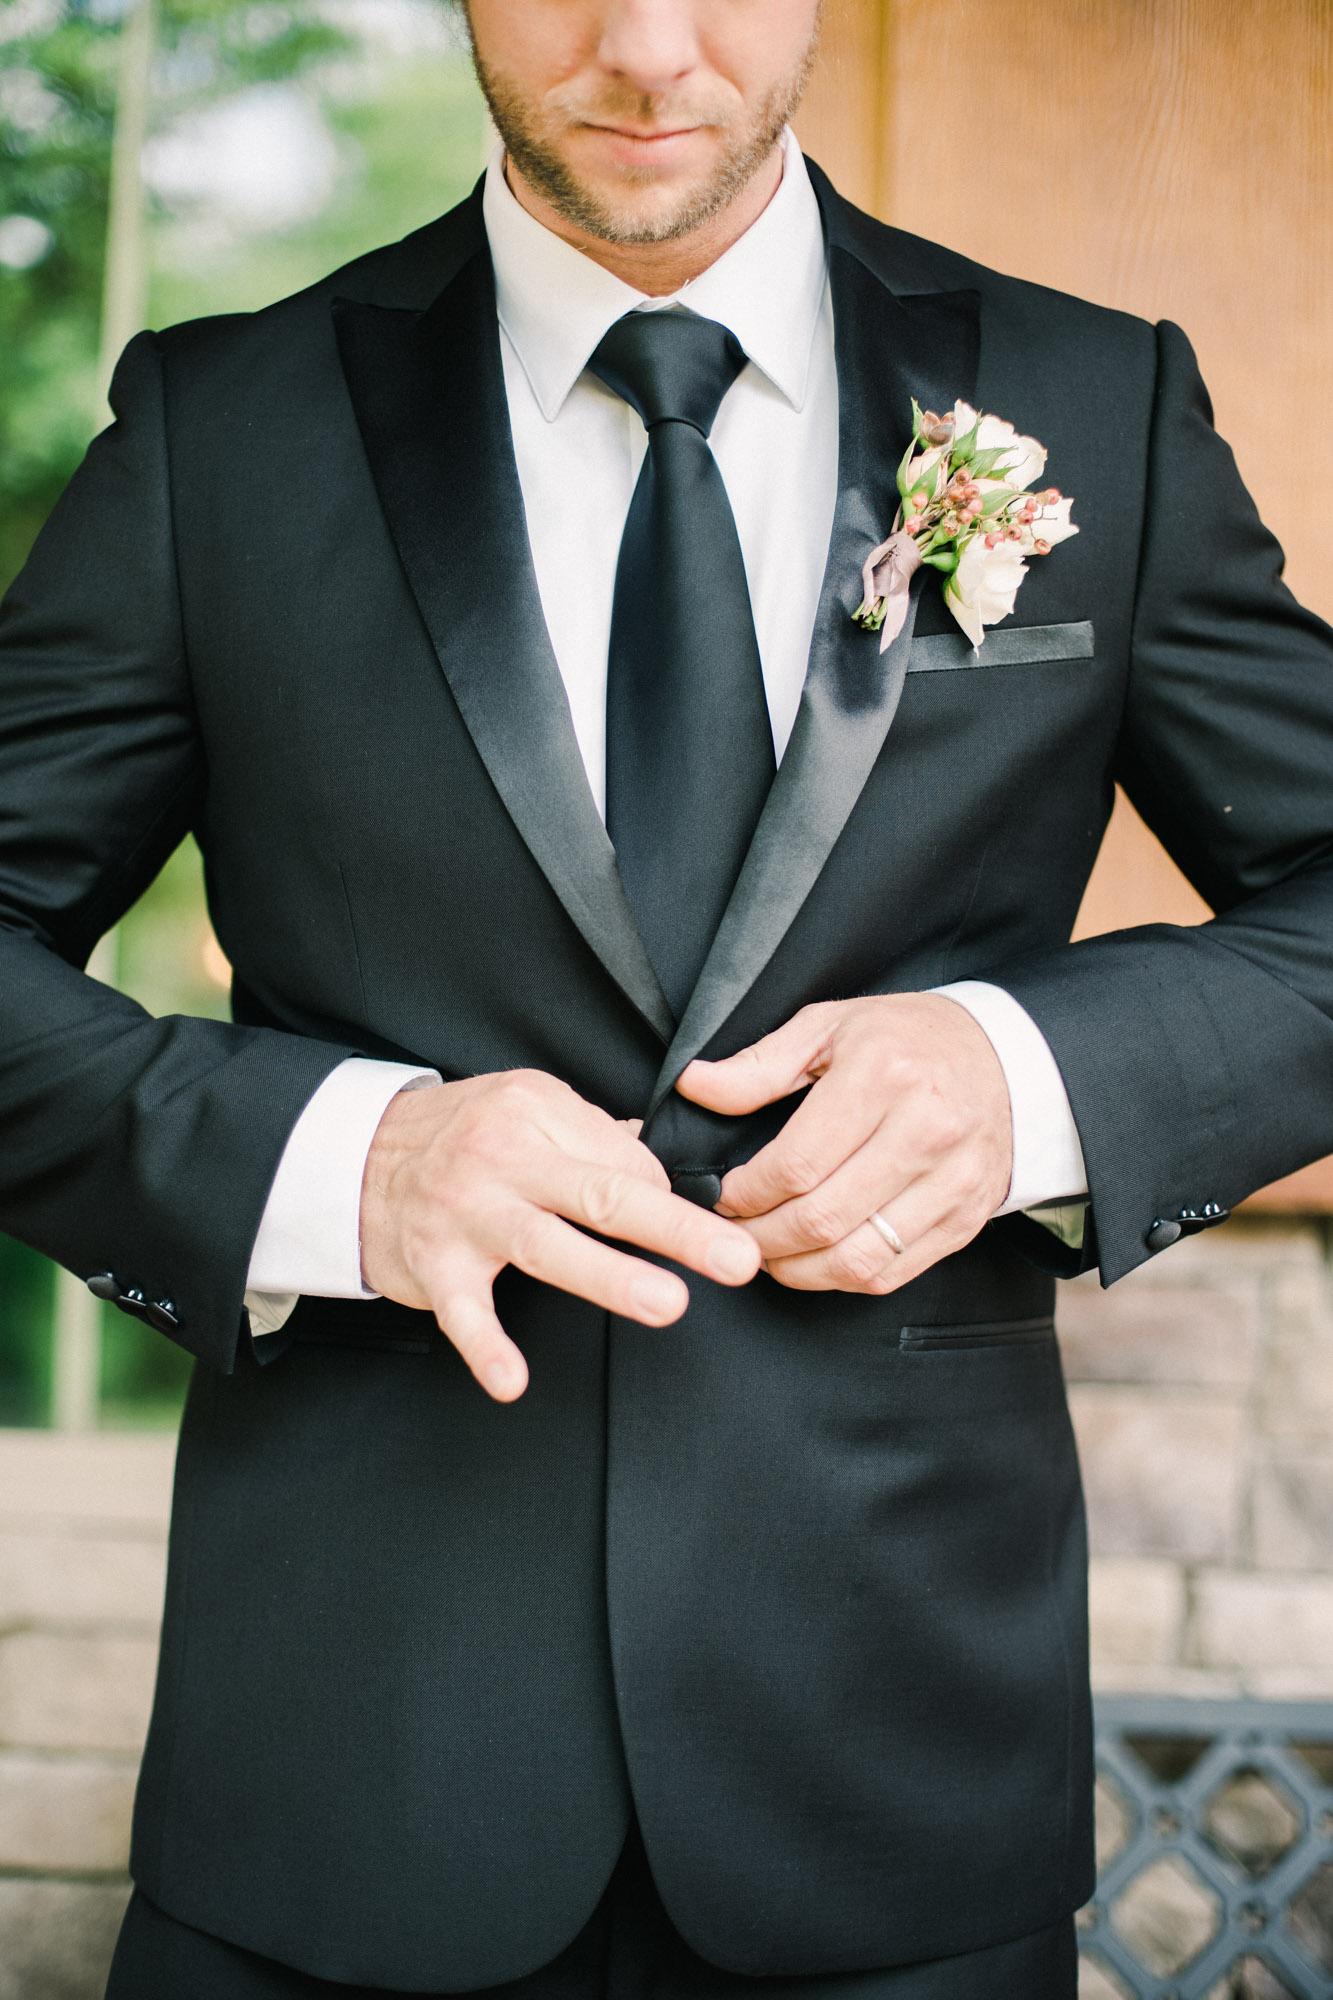 The Wardrobe OKC - Fine Menswear